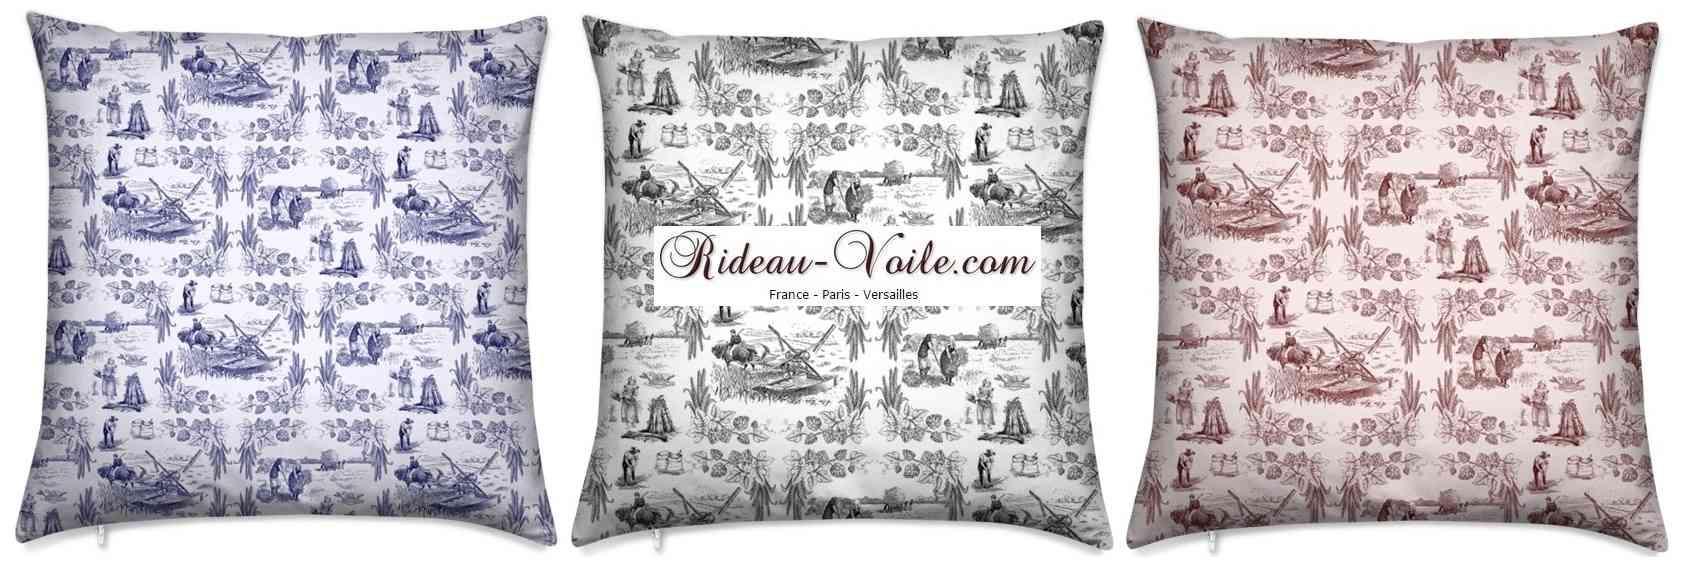 tissu imprim motif toile de jouy empire ameublement dcoration fabrics pattern empire french pattern upholstery paris